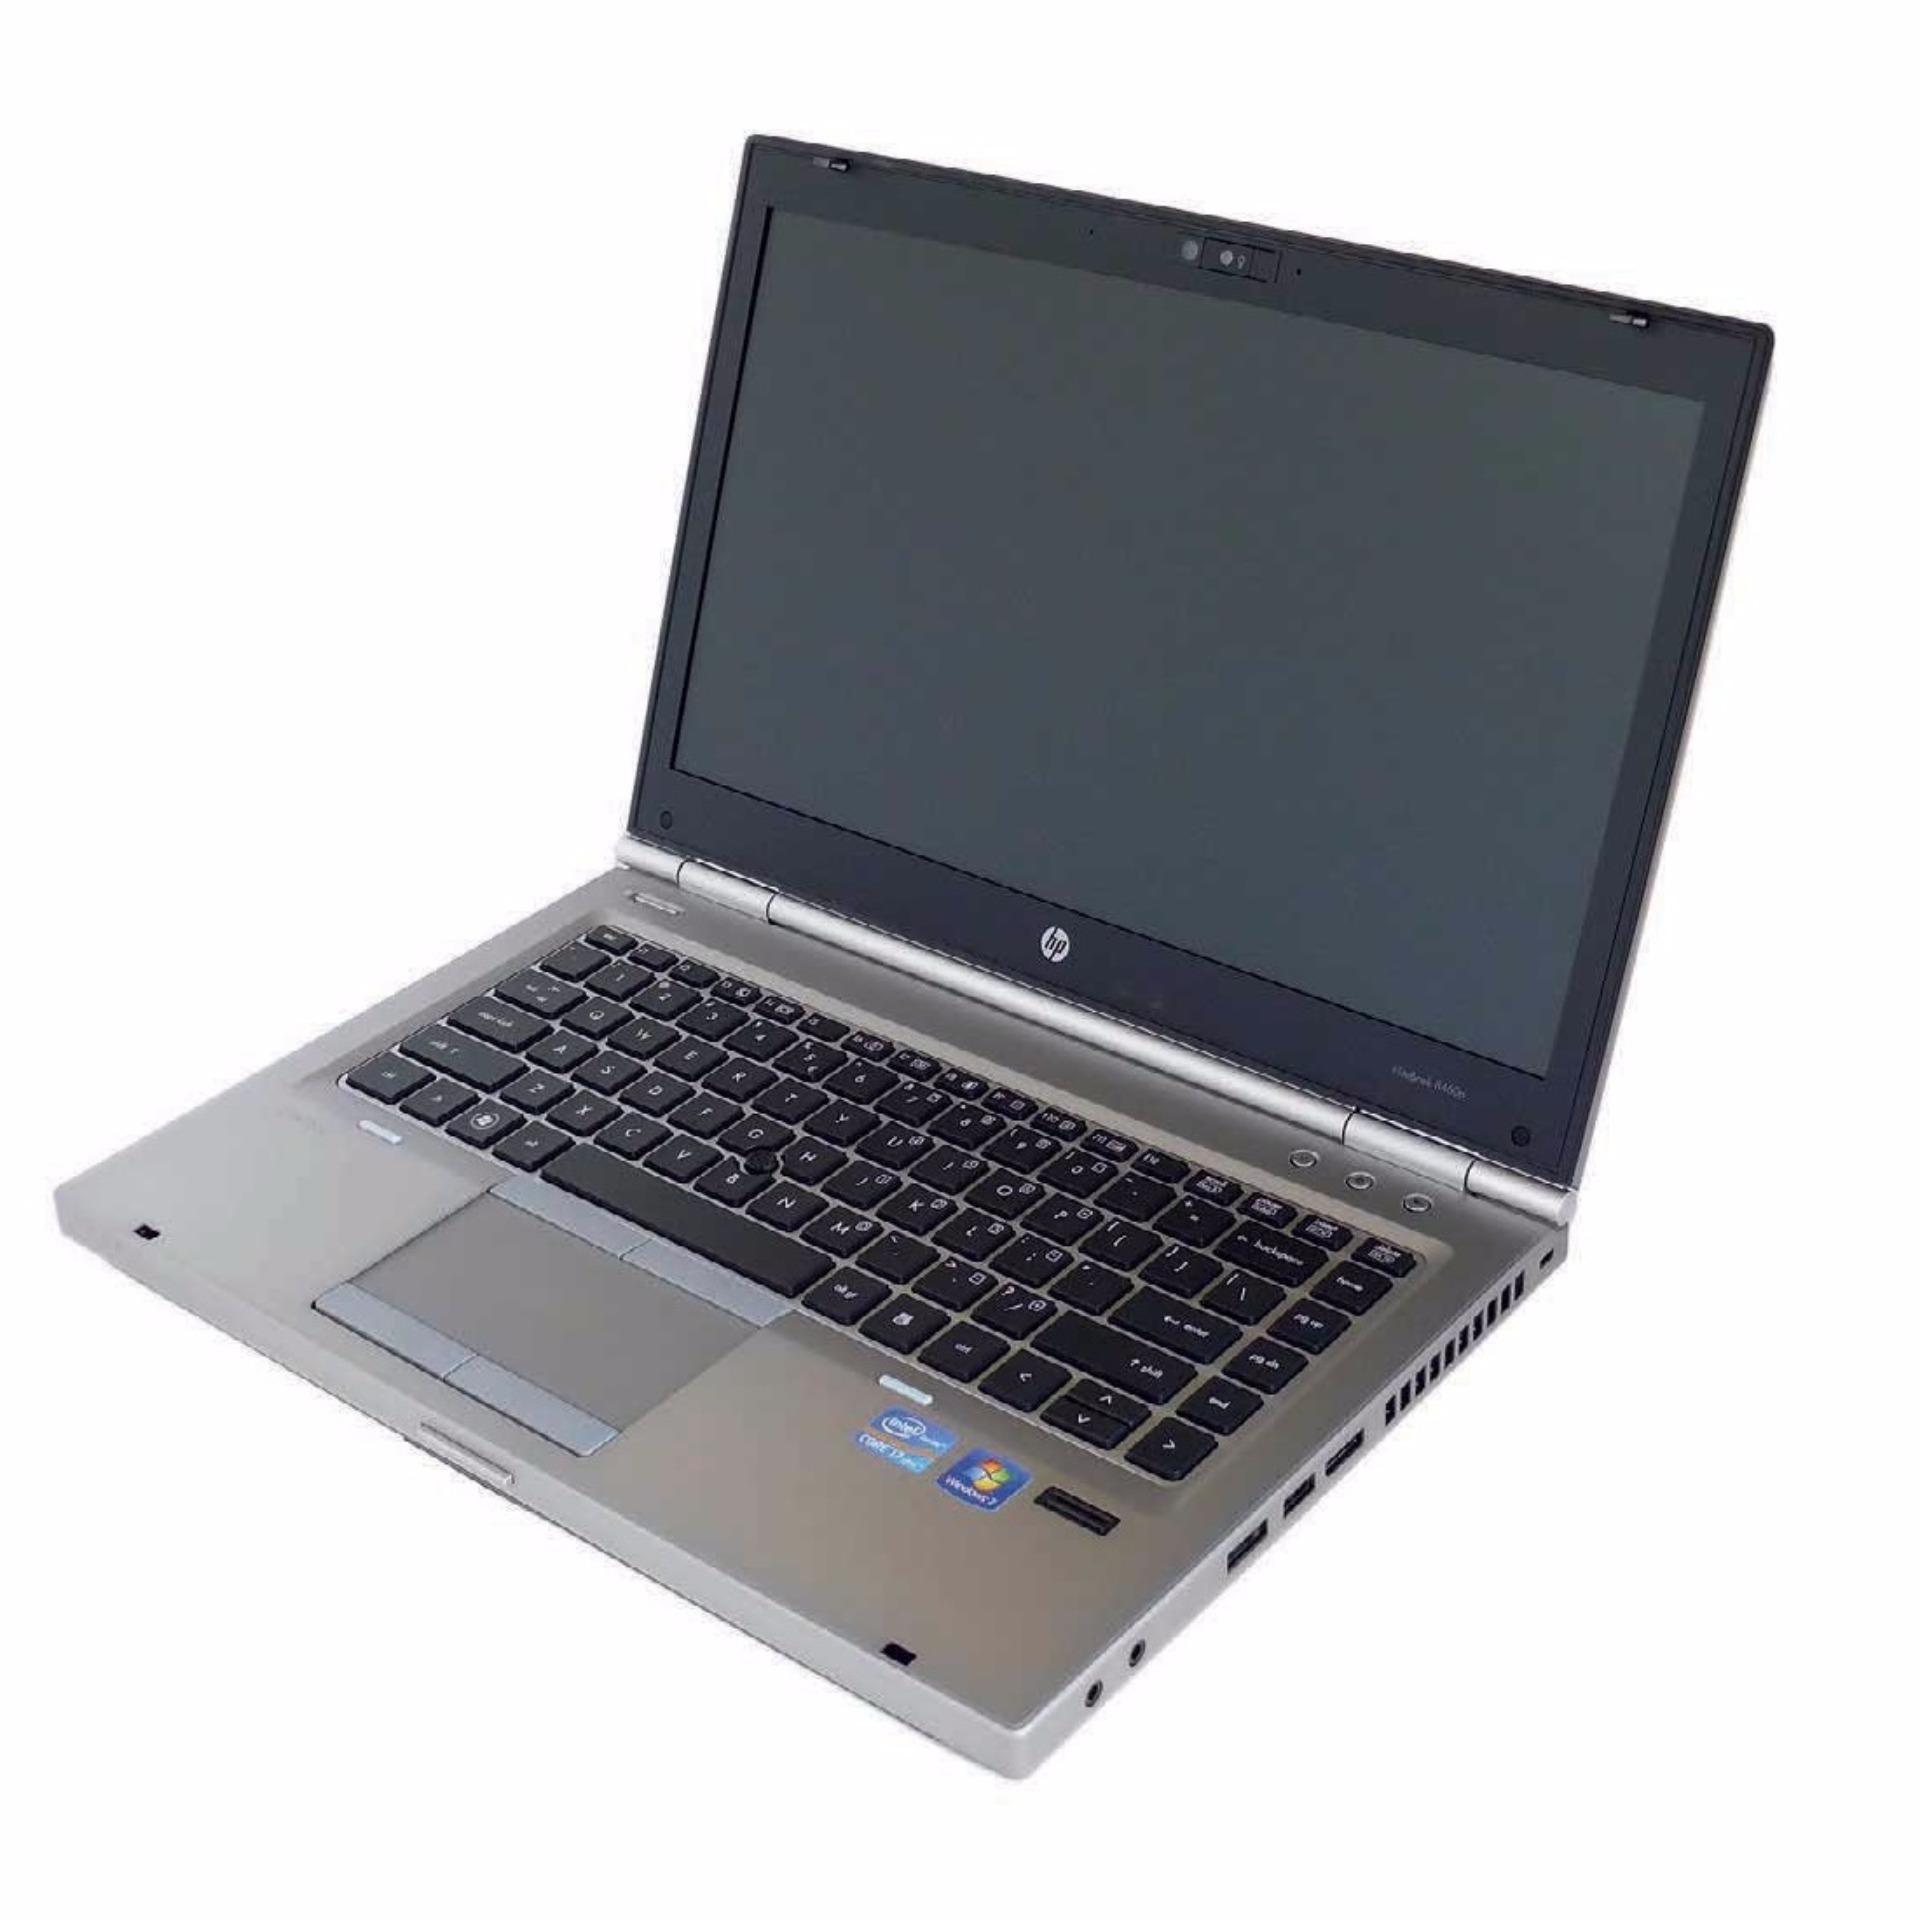 [Refurbished] HP Elitebook 8460p / Intel Core i5 2nd Gen